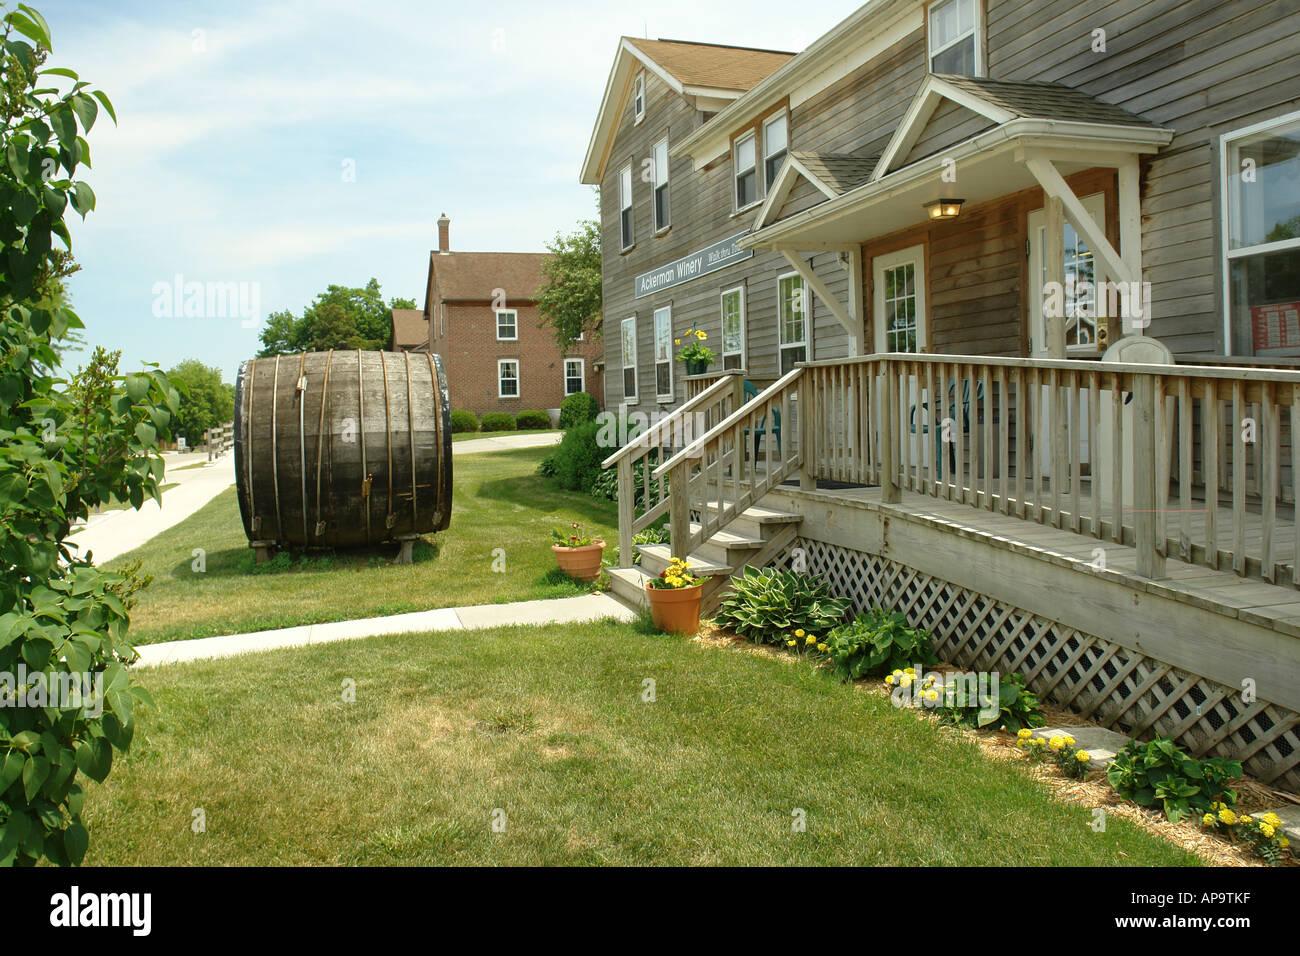 AJD50002, Amana, IA, Iowa, Amana Colonies, National Historic Landmark, Ackerman Winery - Stock Image